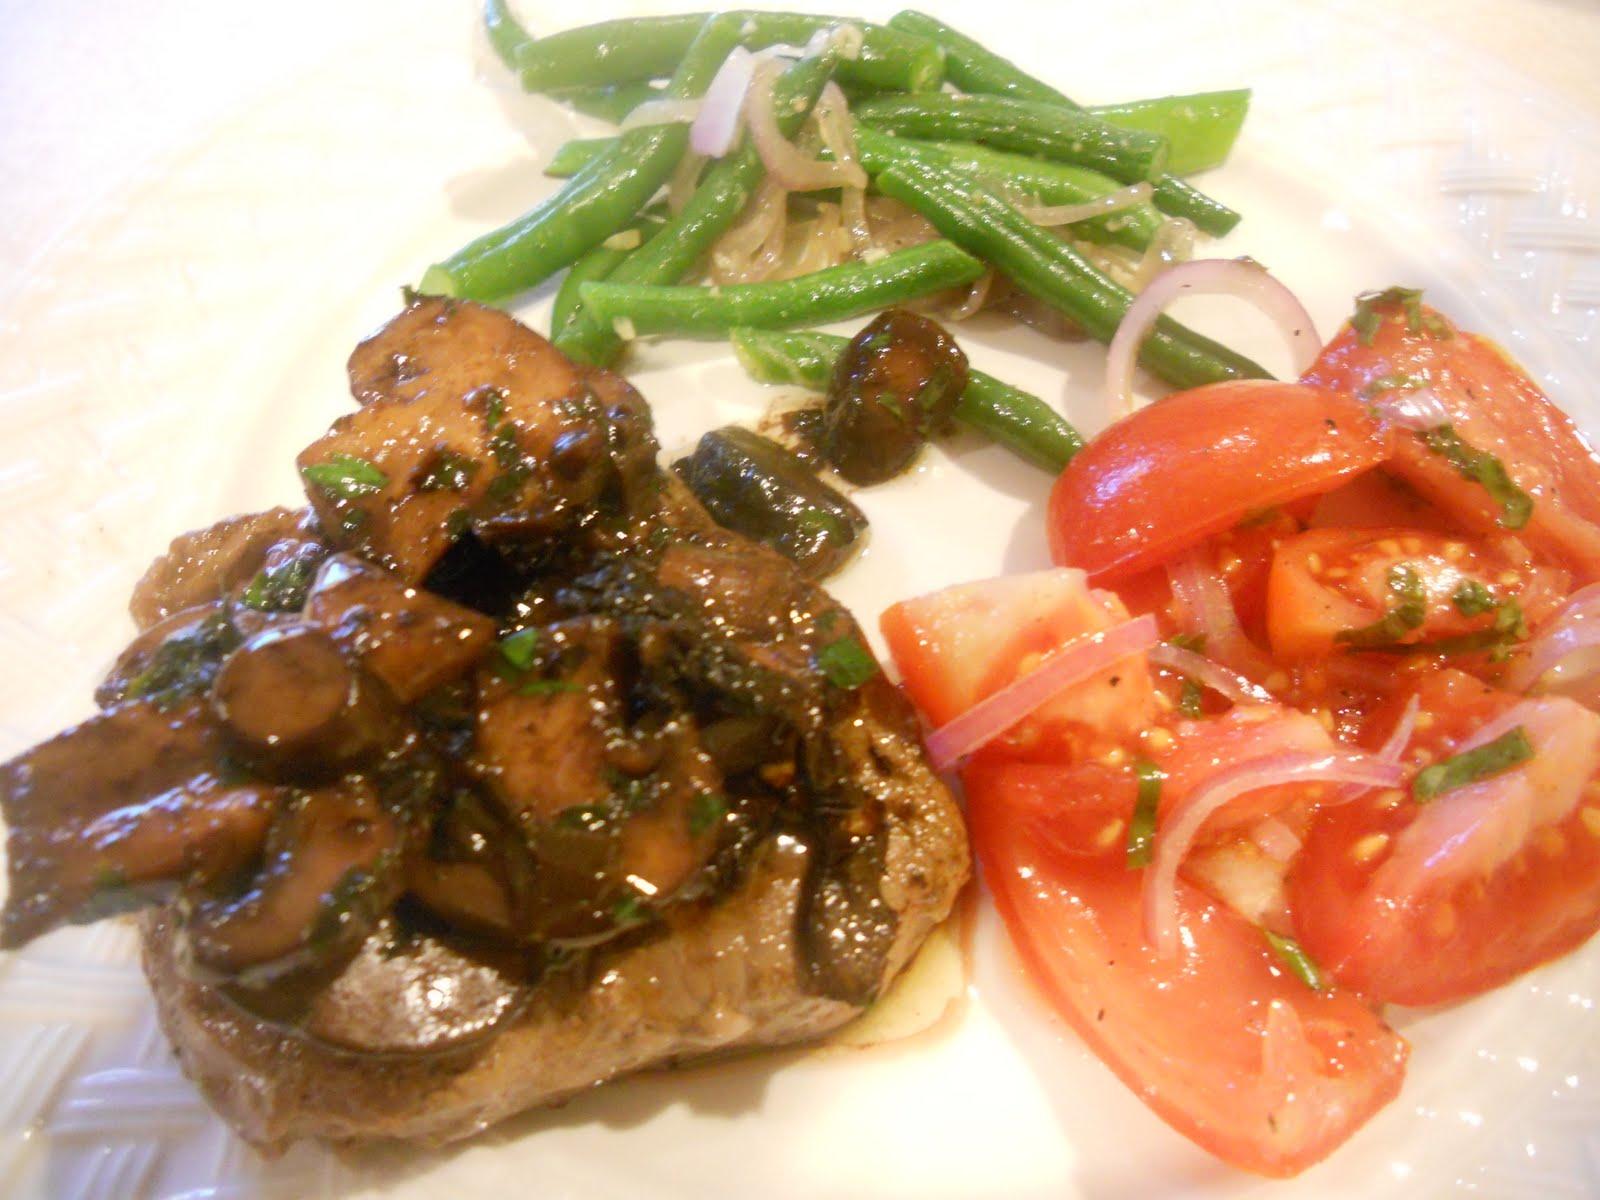 Steak with Mushroom Sauce - Just~One~Donna